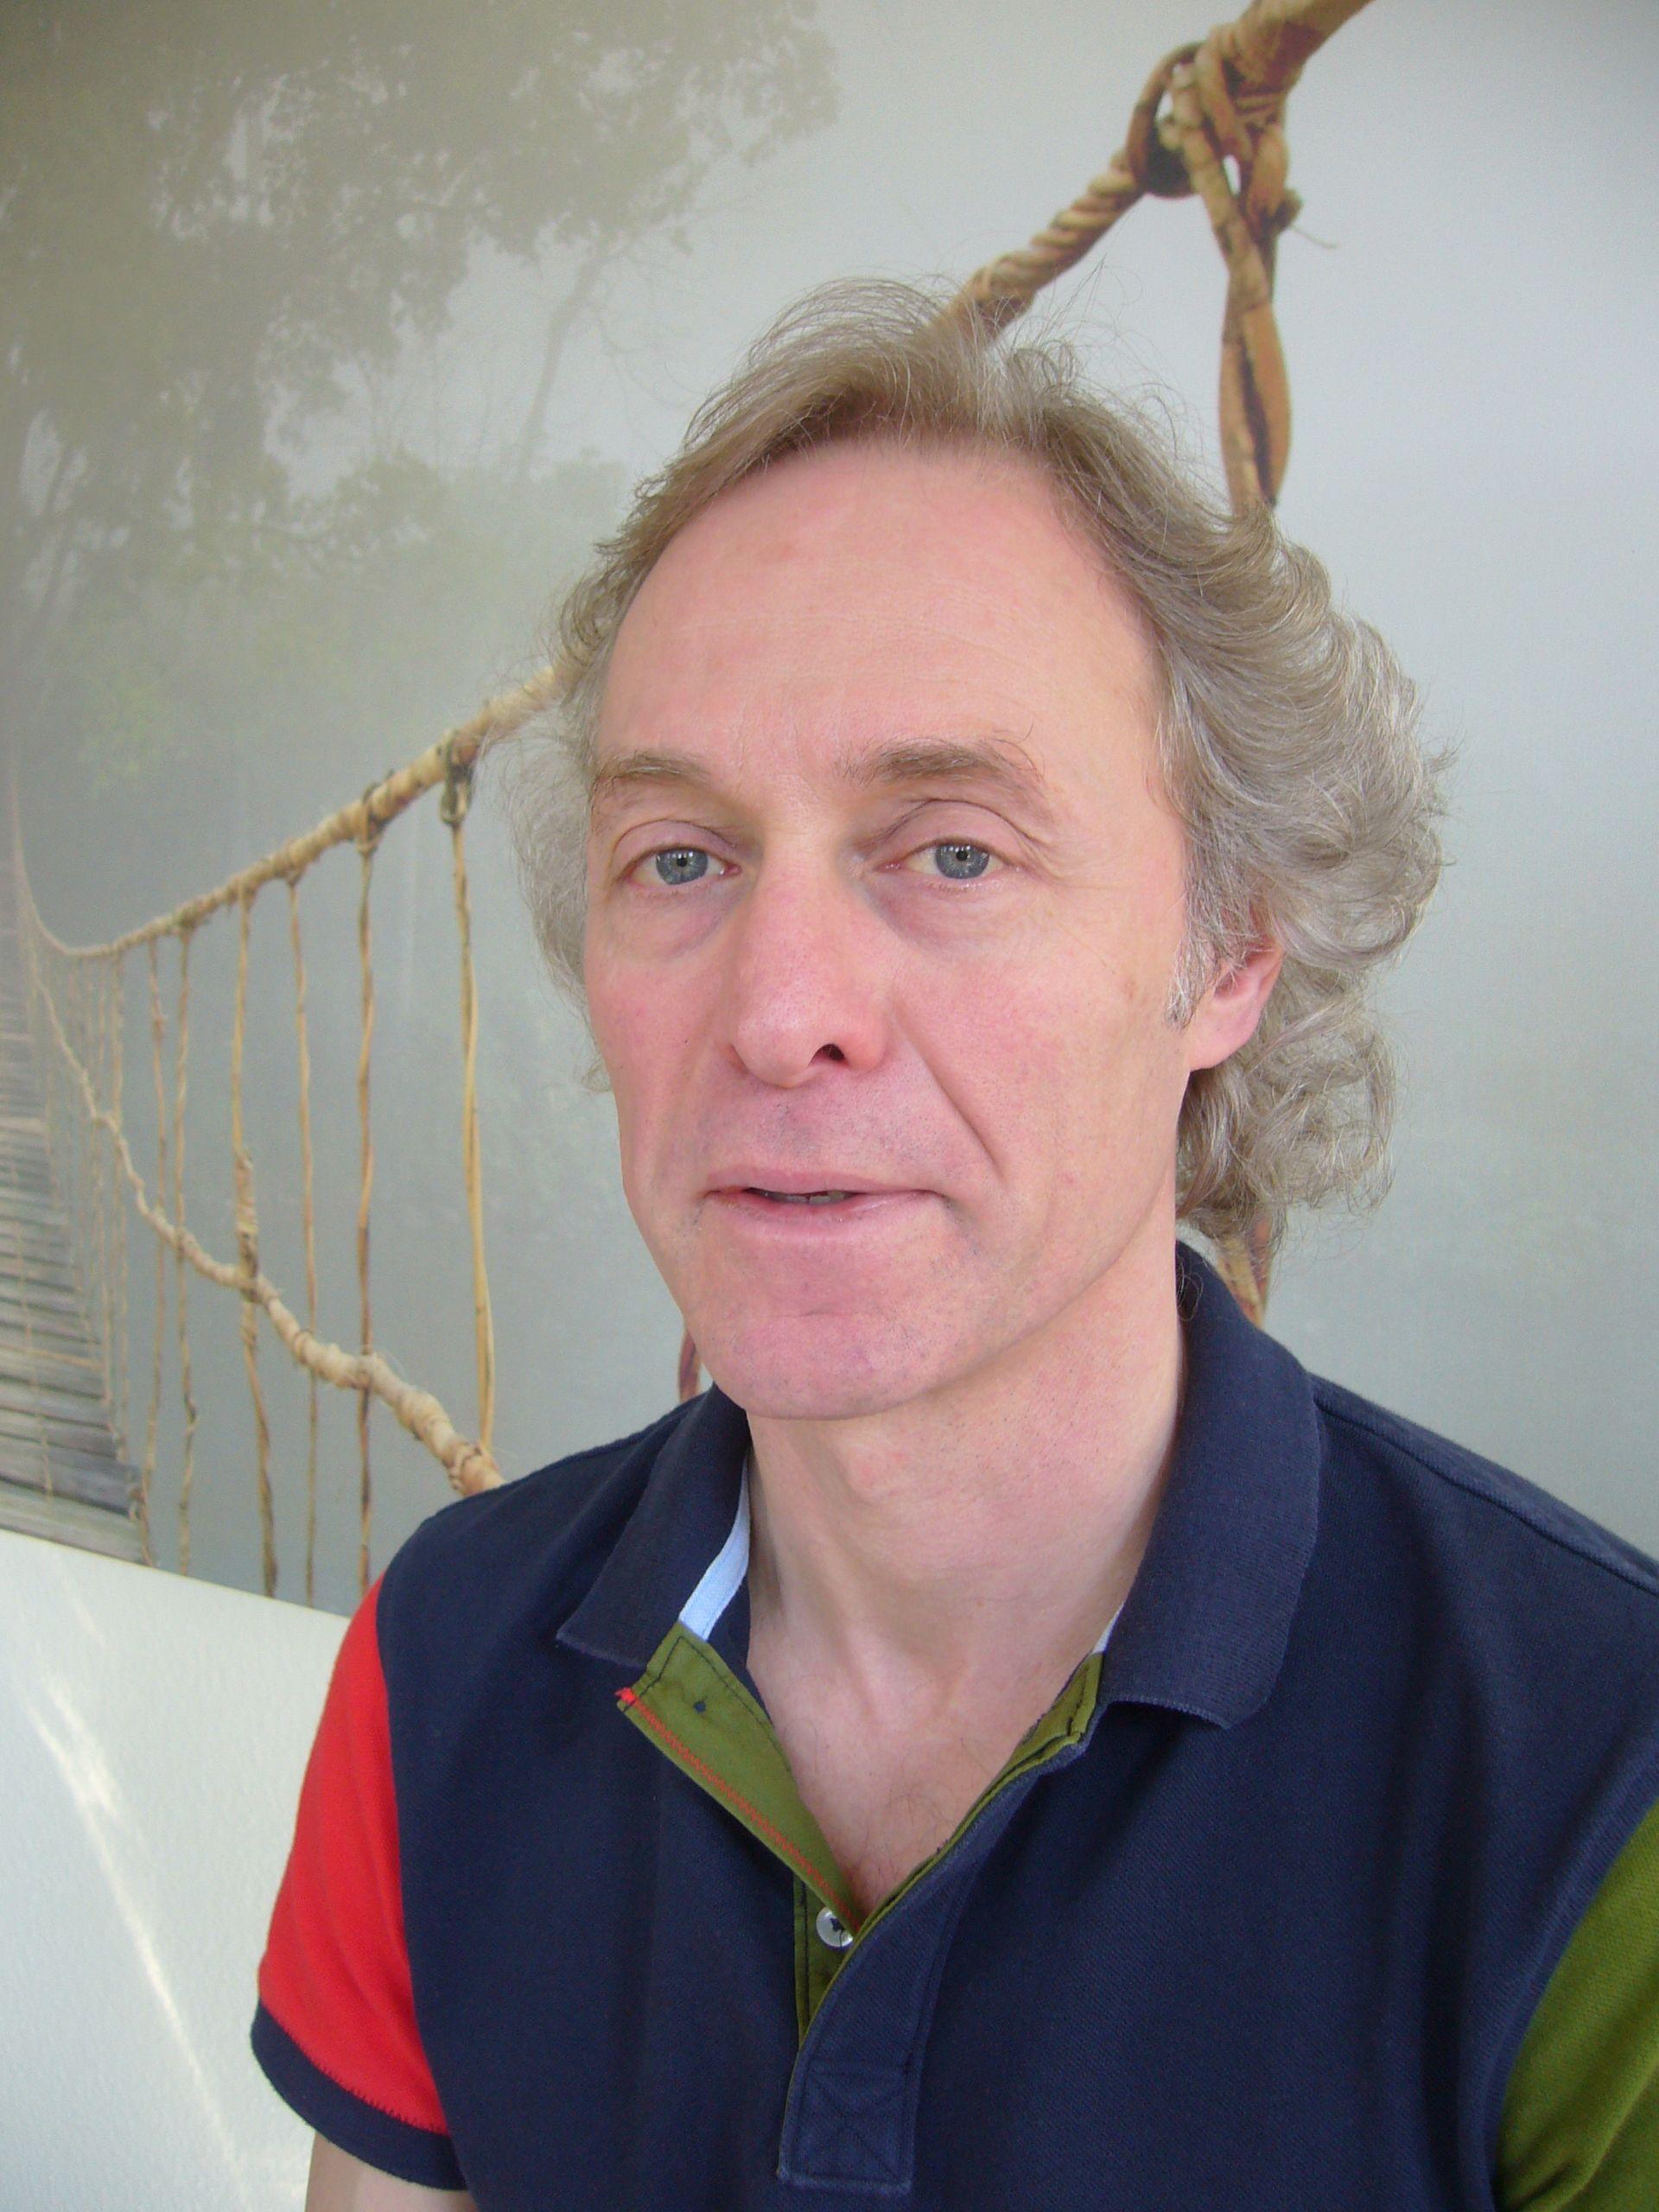 Bernd Fisseler